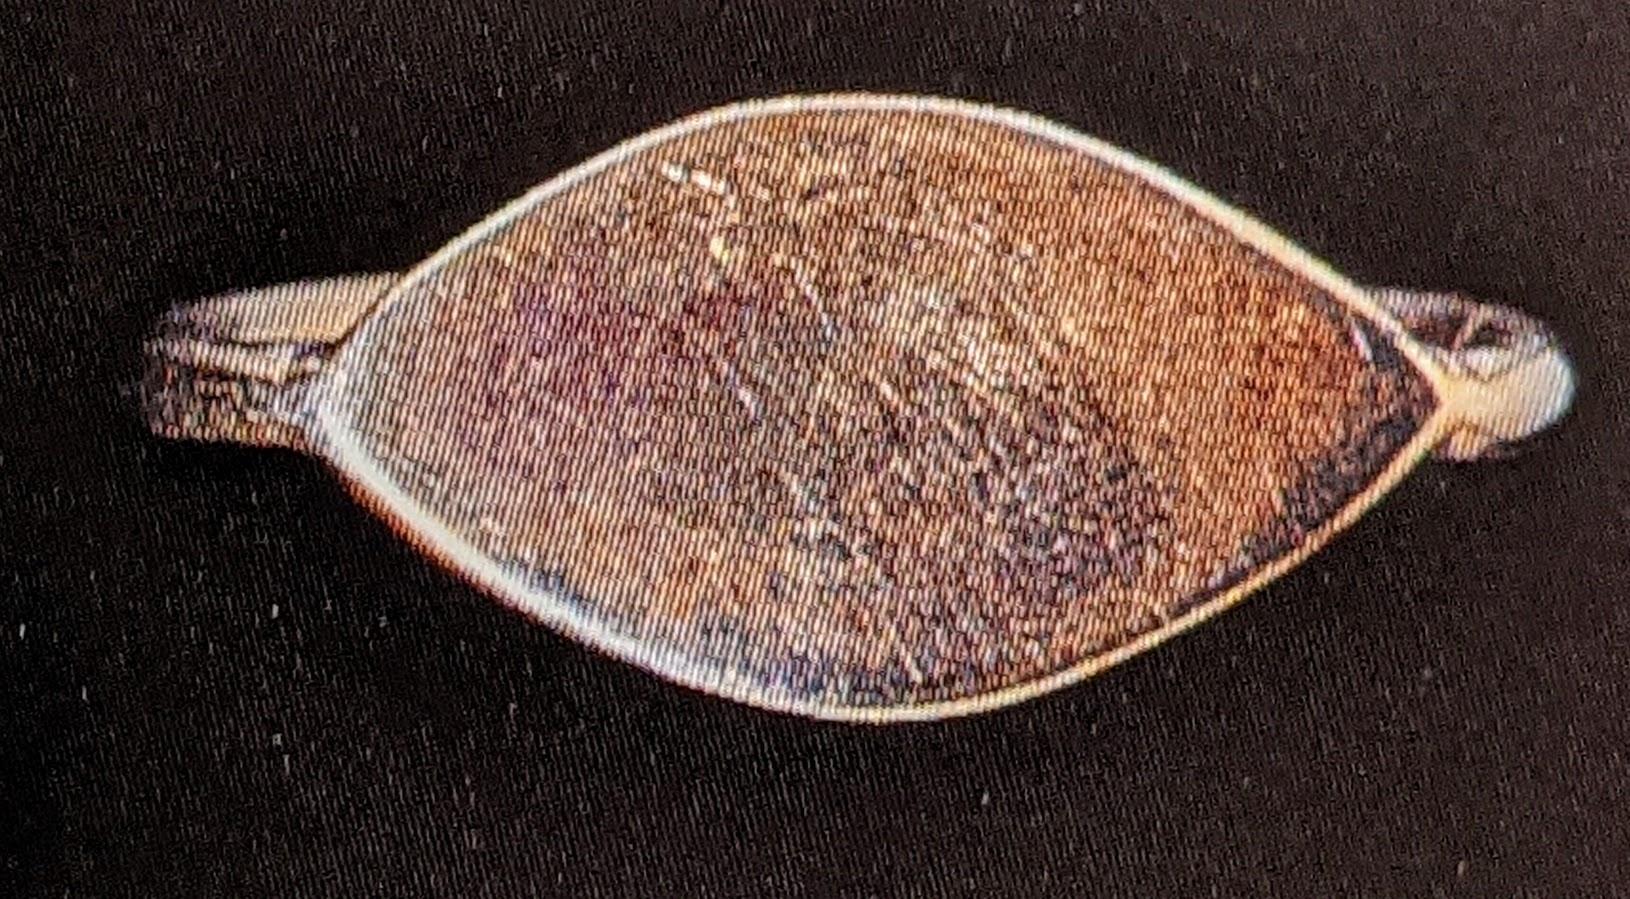 Electrum ring